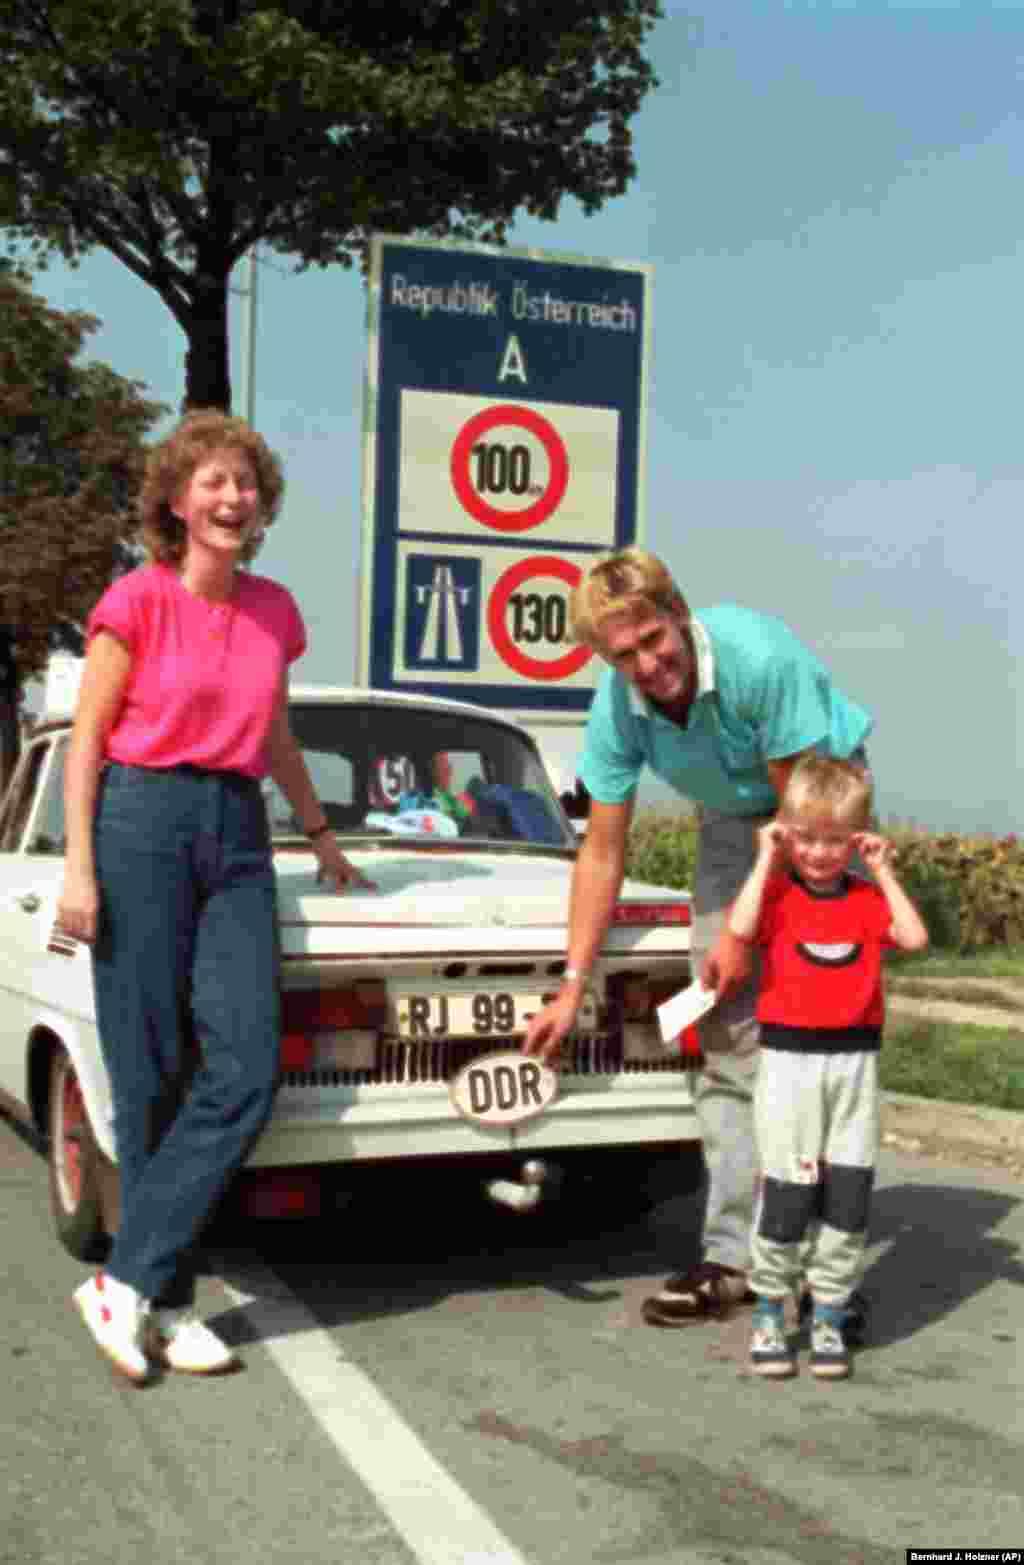 A family removes their DDR (Deutsche Demokratische Republik) badge after crossing intoKlingenbach, Austria.